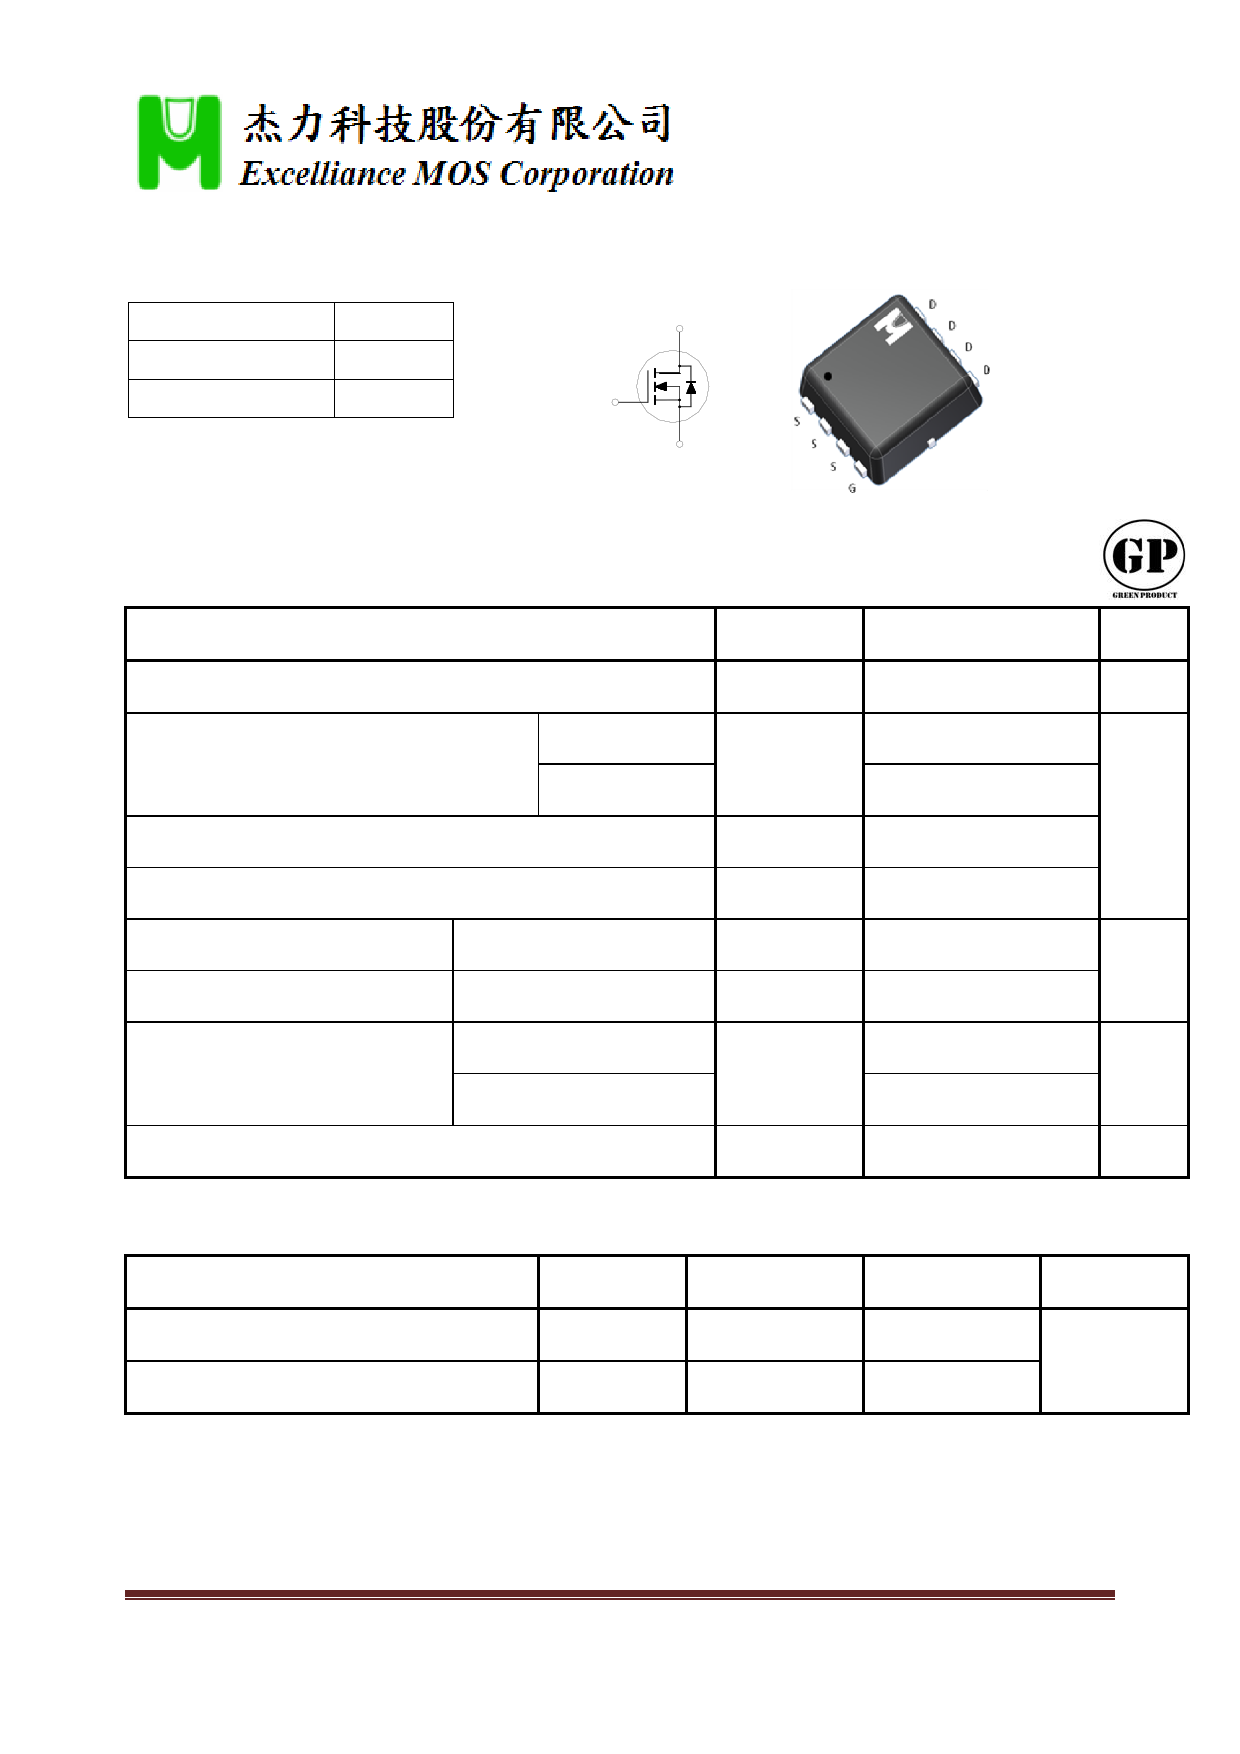 EMB16N06V دیتاشیت PDF